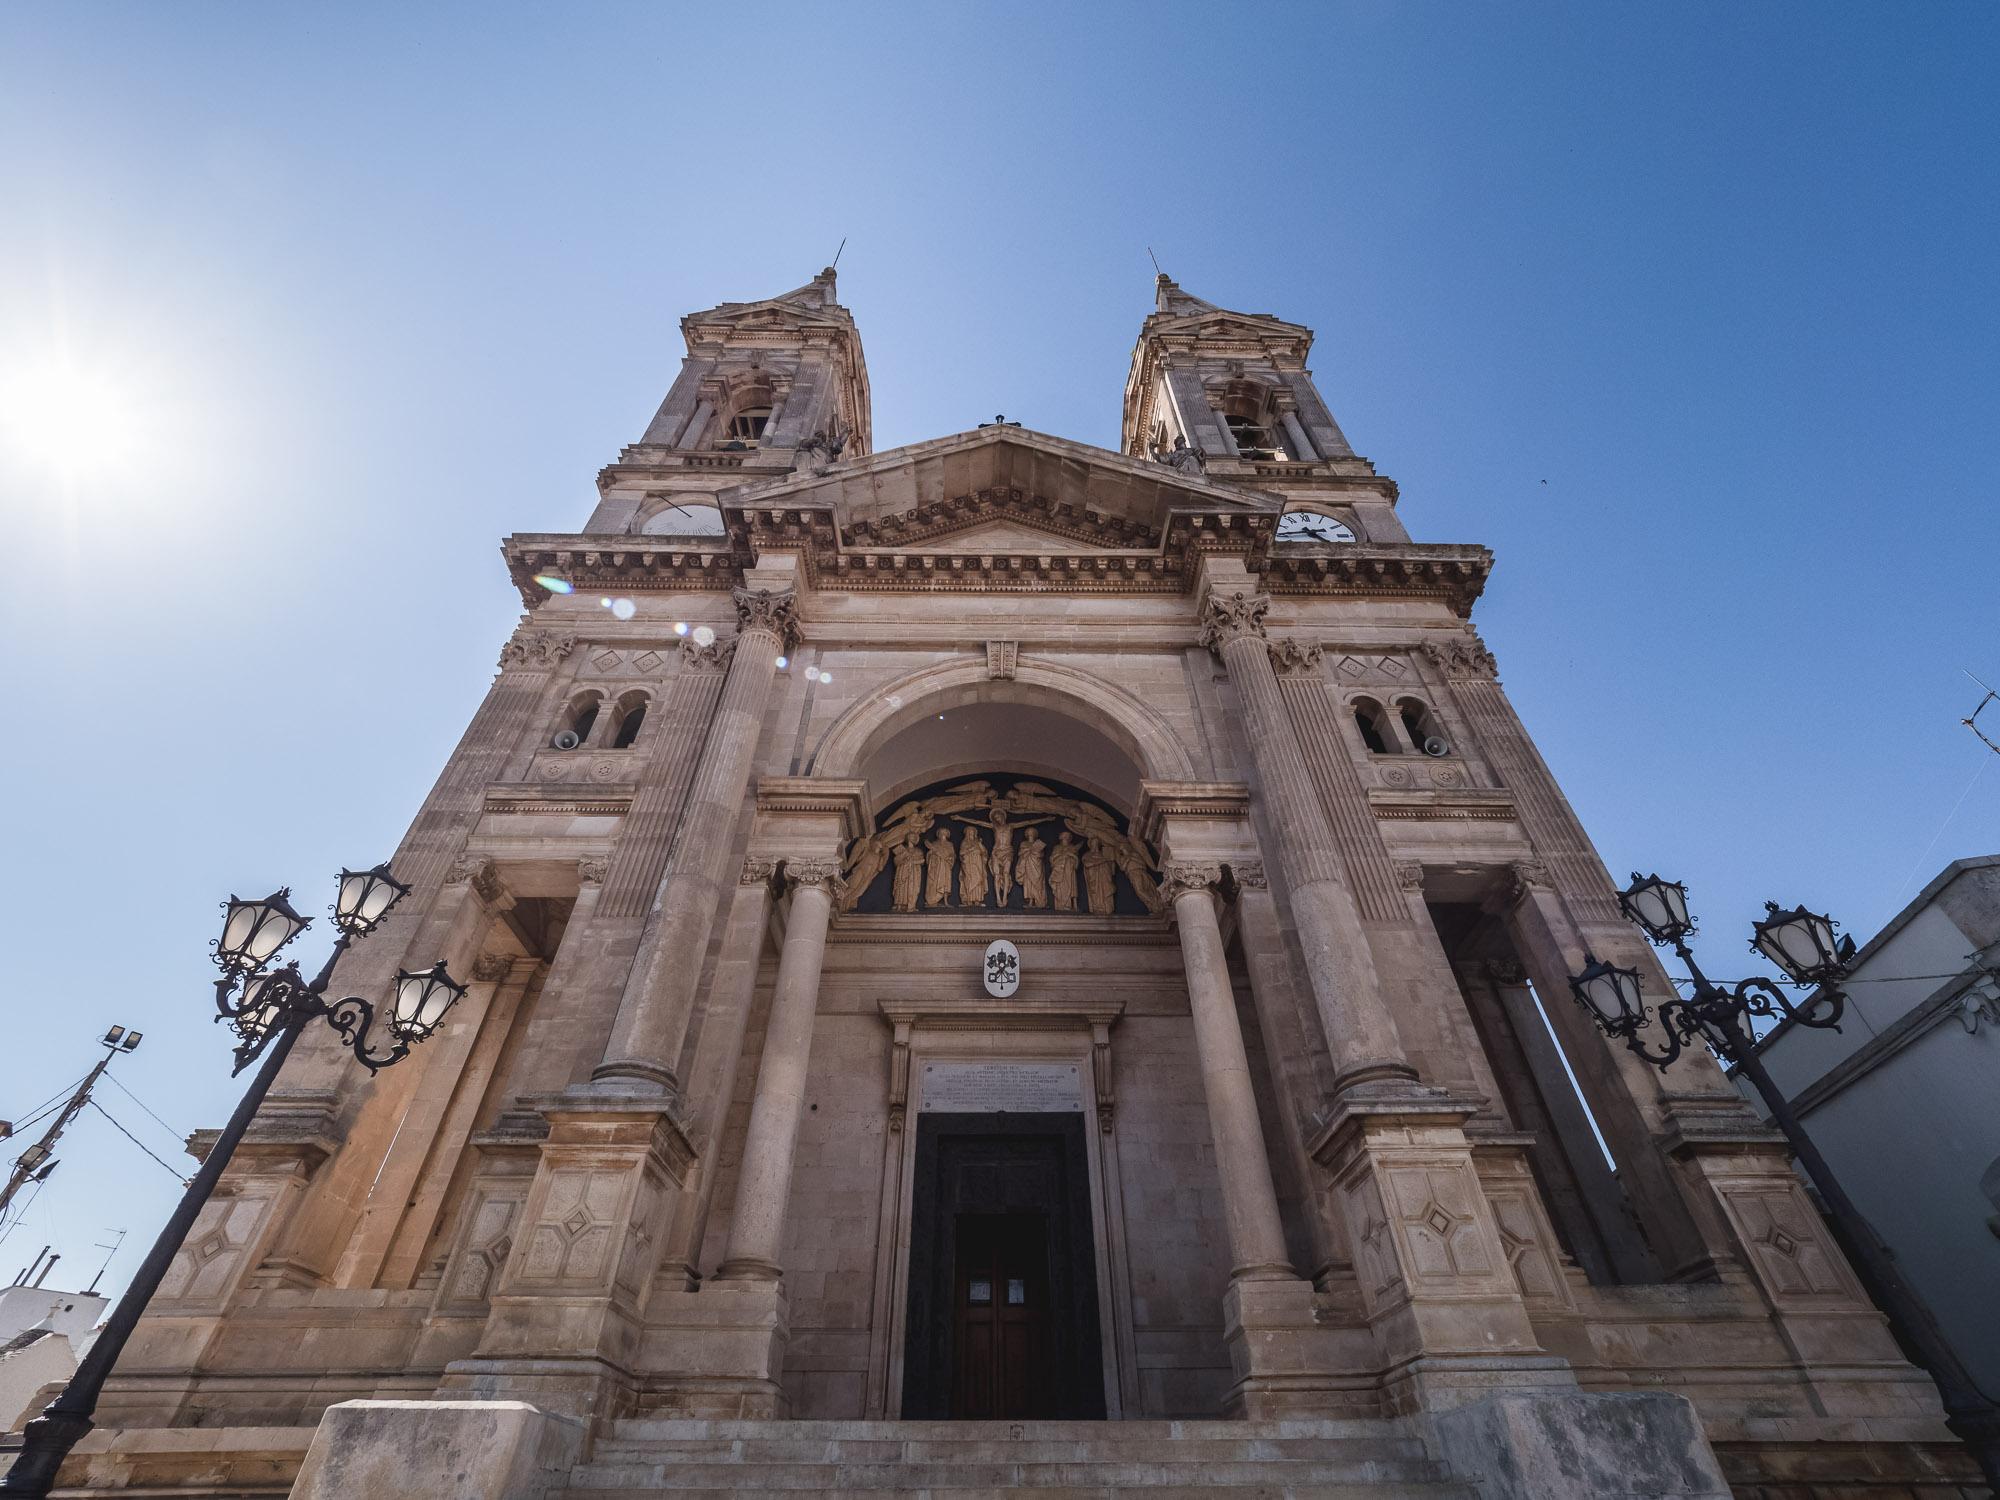 Basilica of Saints Cosmas and Damian